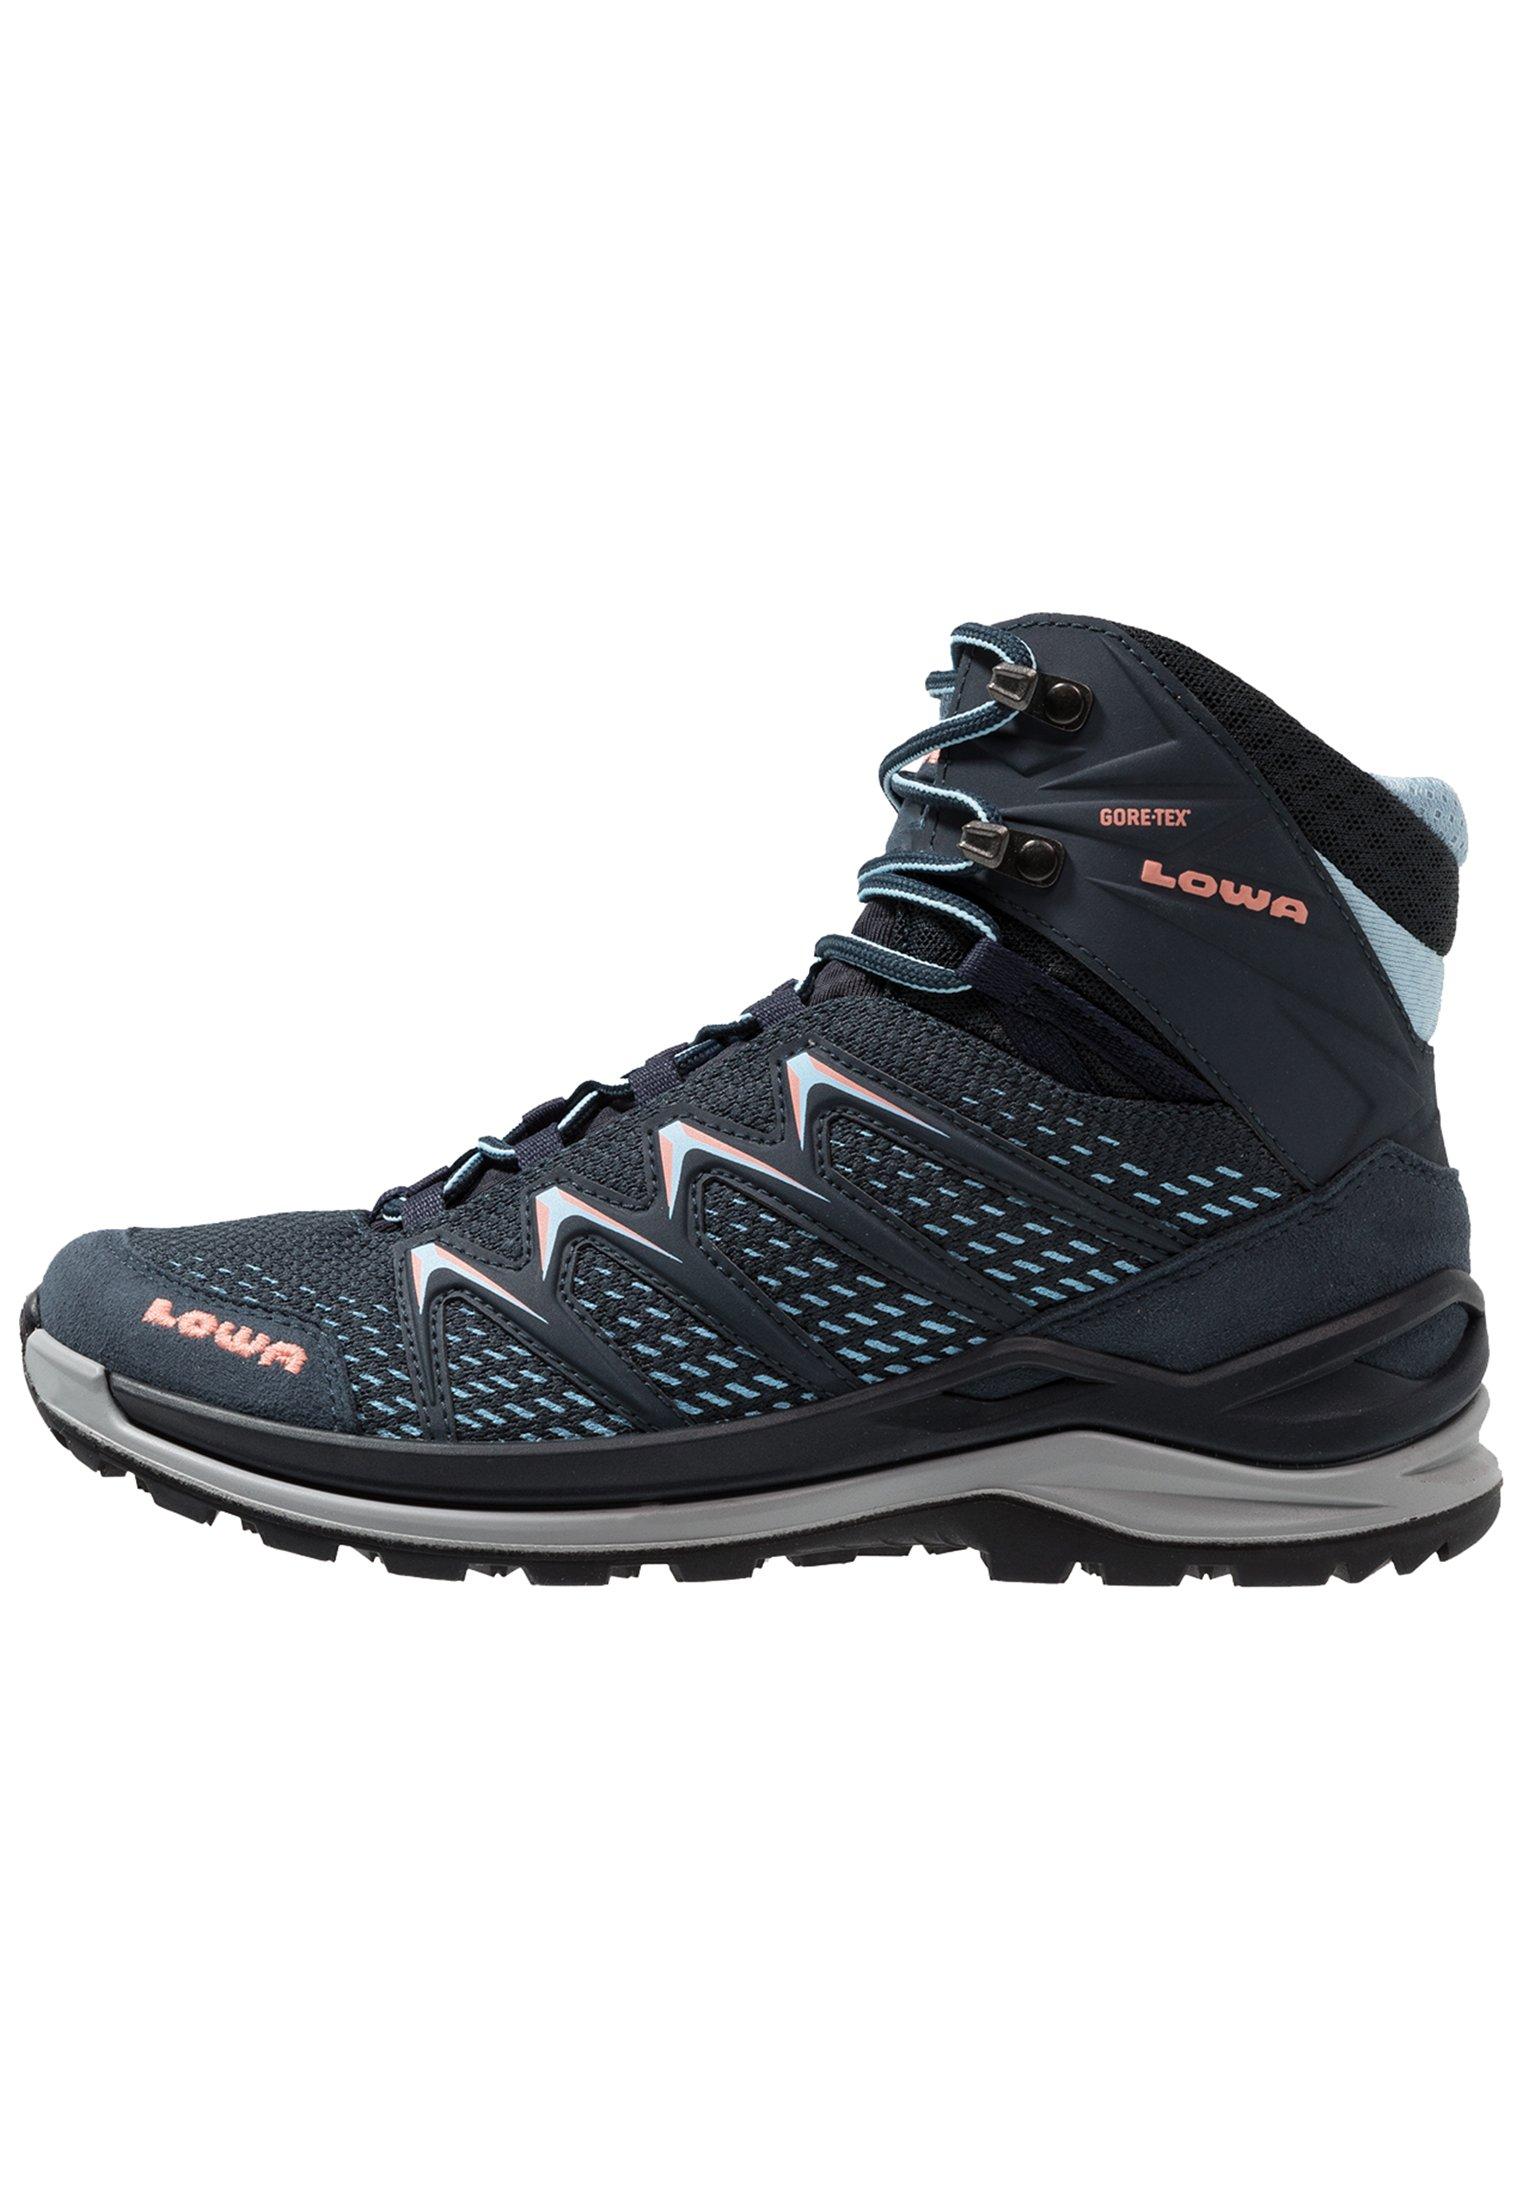 INNOX PRO GTX MID Hikingschuh stahlblaulachs